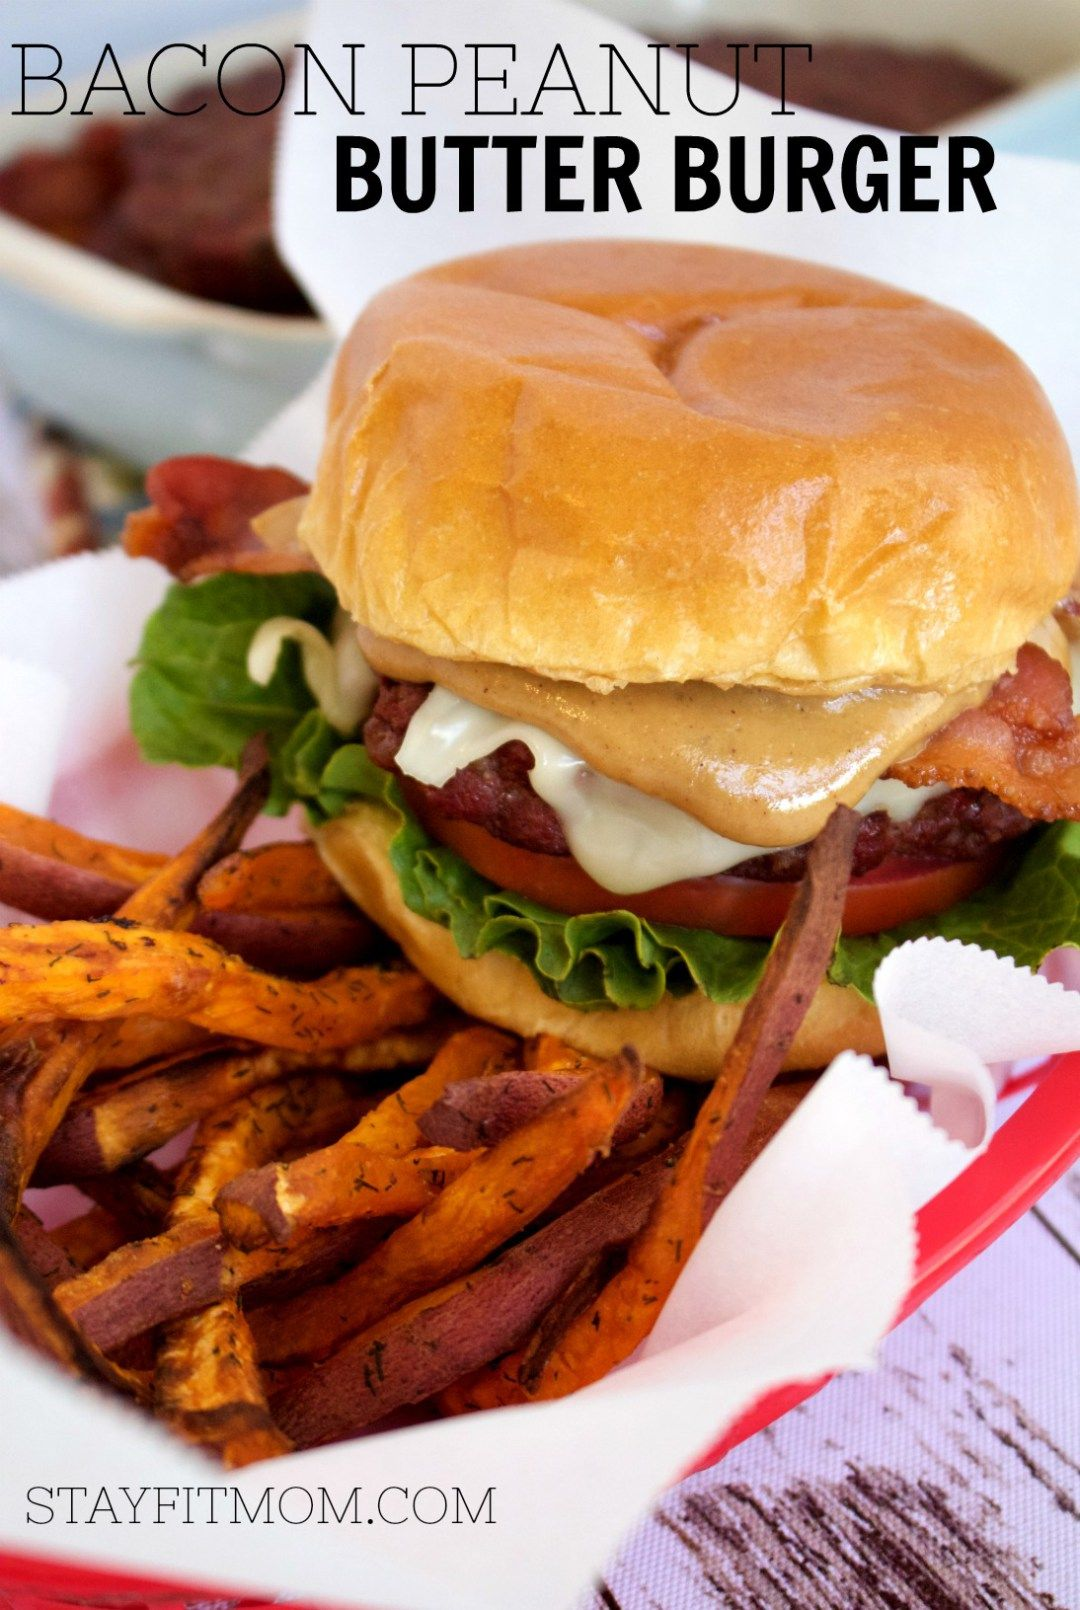 Bacon Peanut Butter Burger Recipe Peanut butter burger